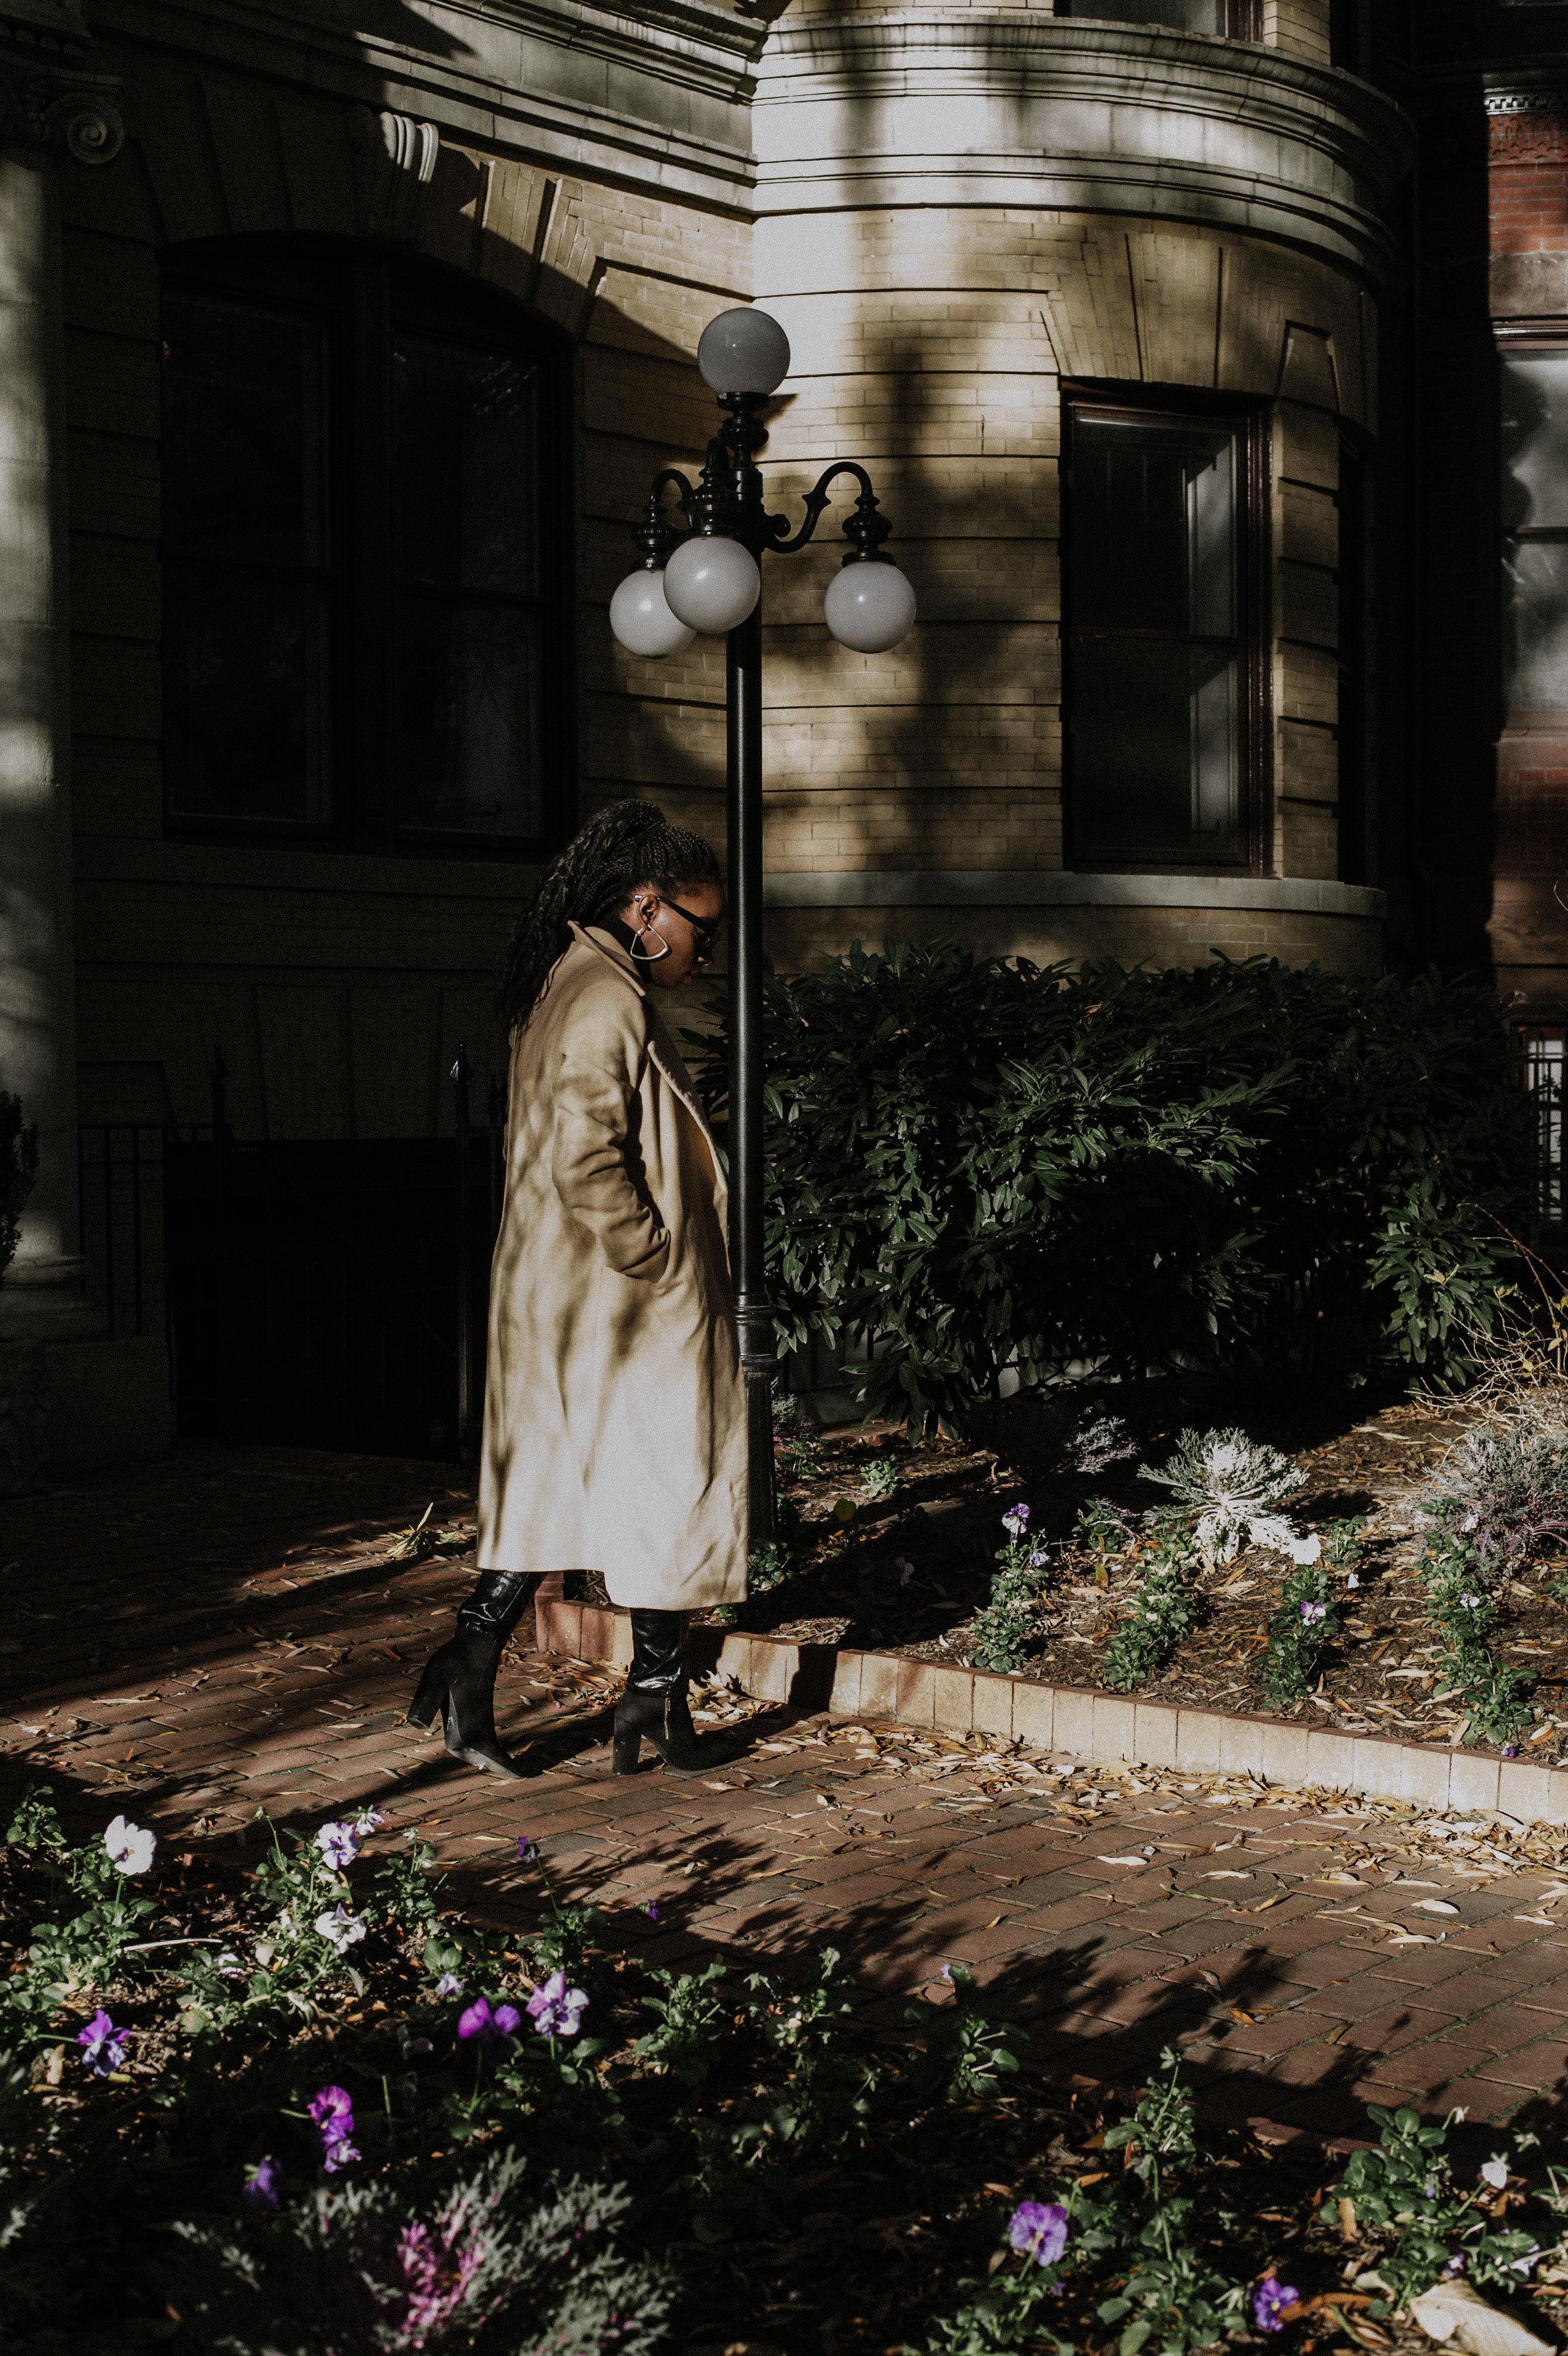 The-Glossier-Tasha-James-Fashion-Style-Blogger-DC-Winter-Coat-All-Black-11.jpg